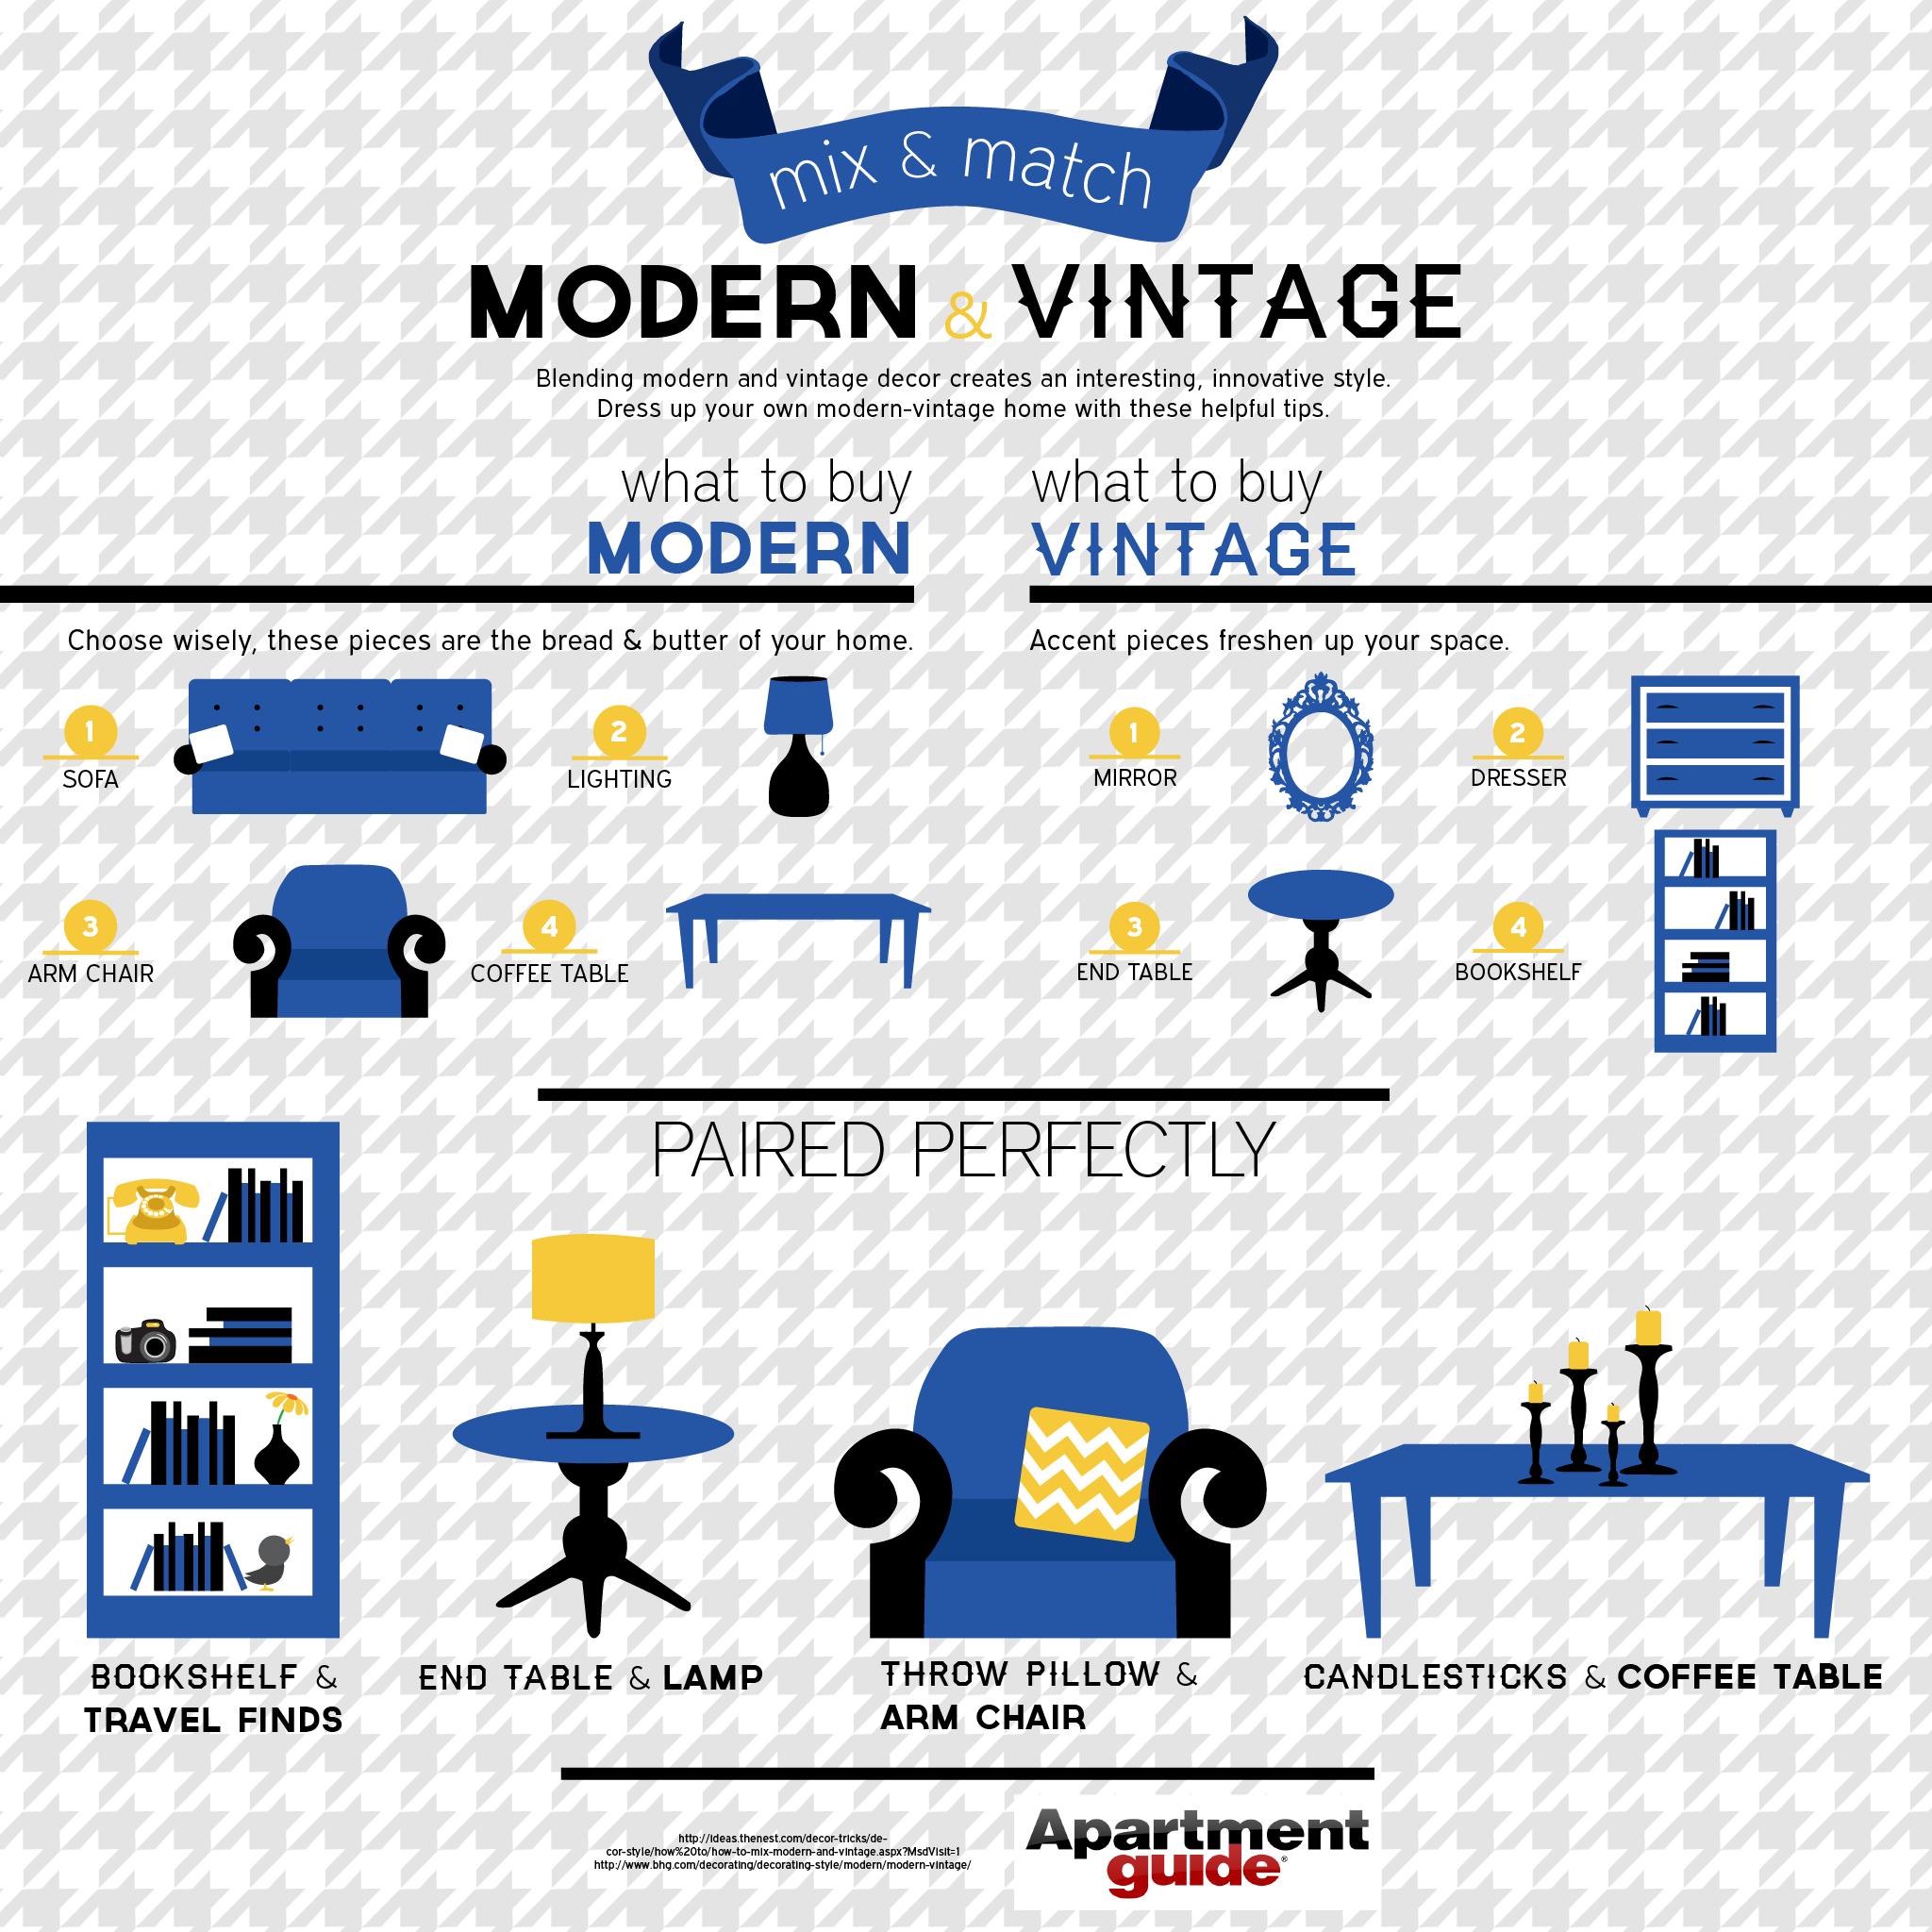 Mix U0026 Match   Modern U0026 Vintage : Blending Modern And Vintage Decor Creates  An Interesting, Innovative Style. Dress Up Your Own Modern Vintage Home  With ... Part 64